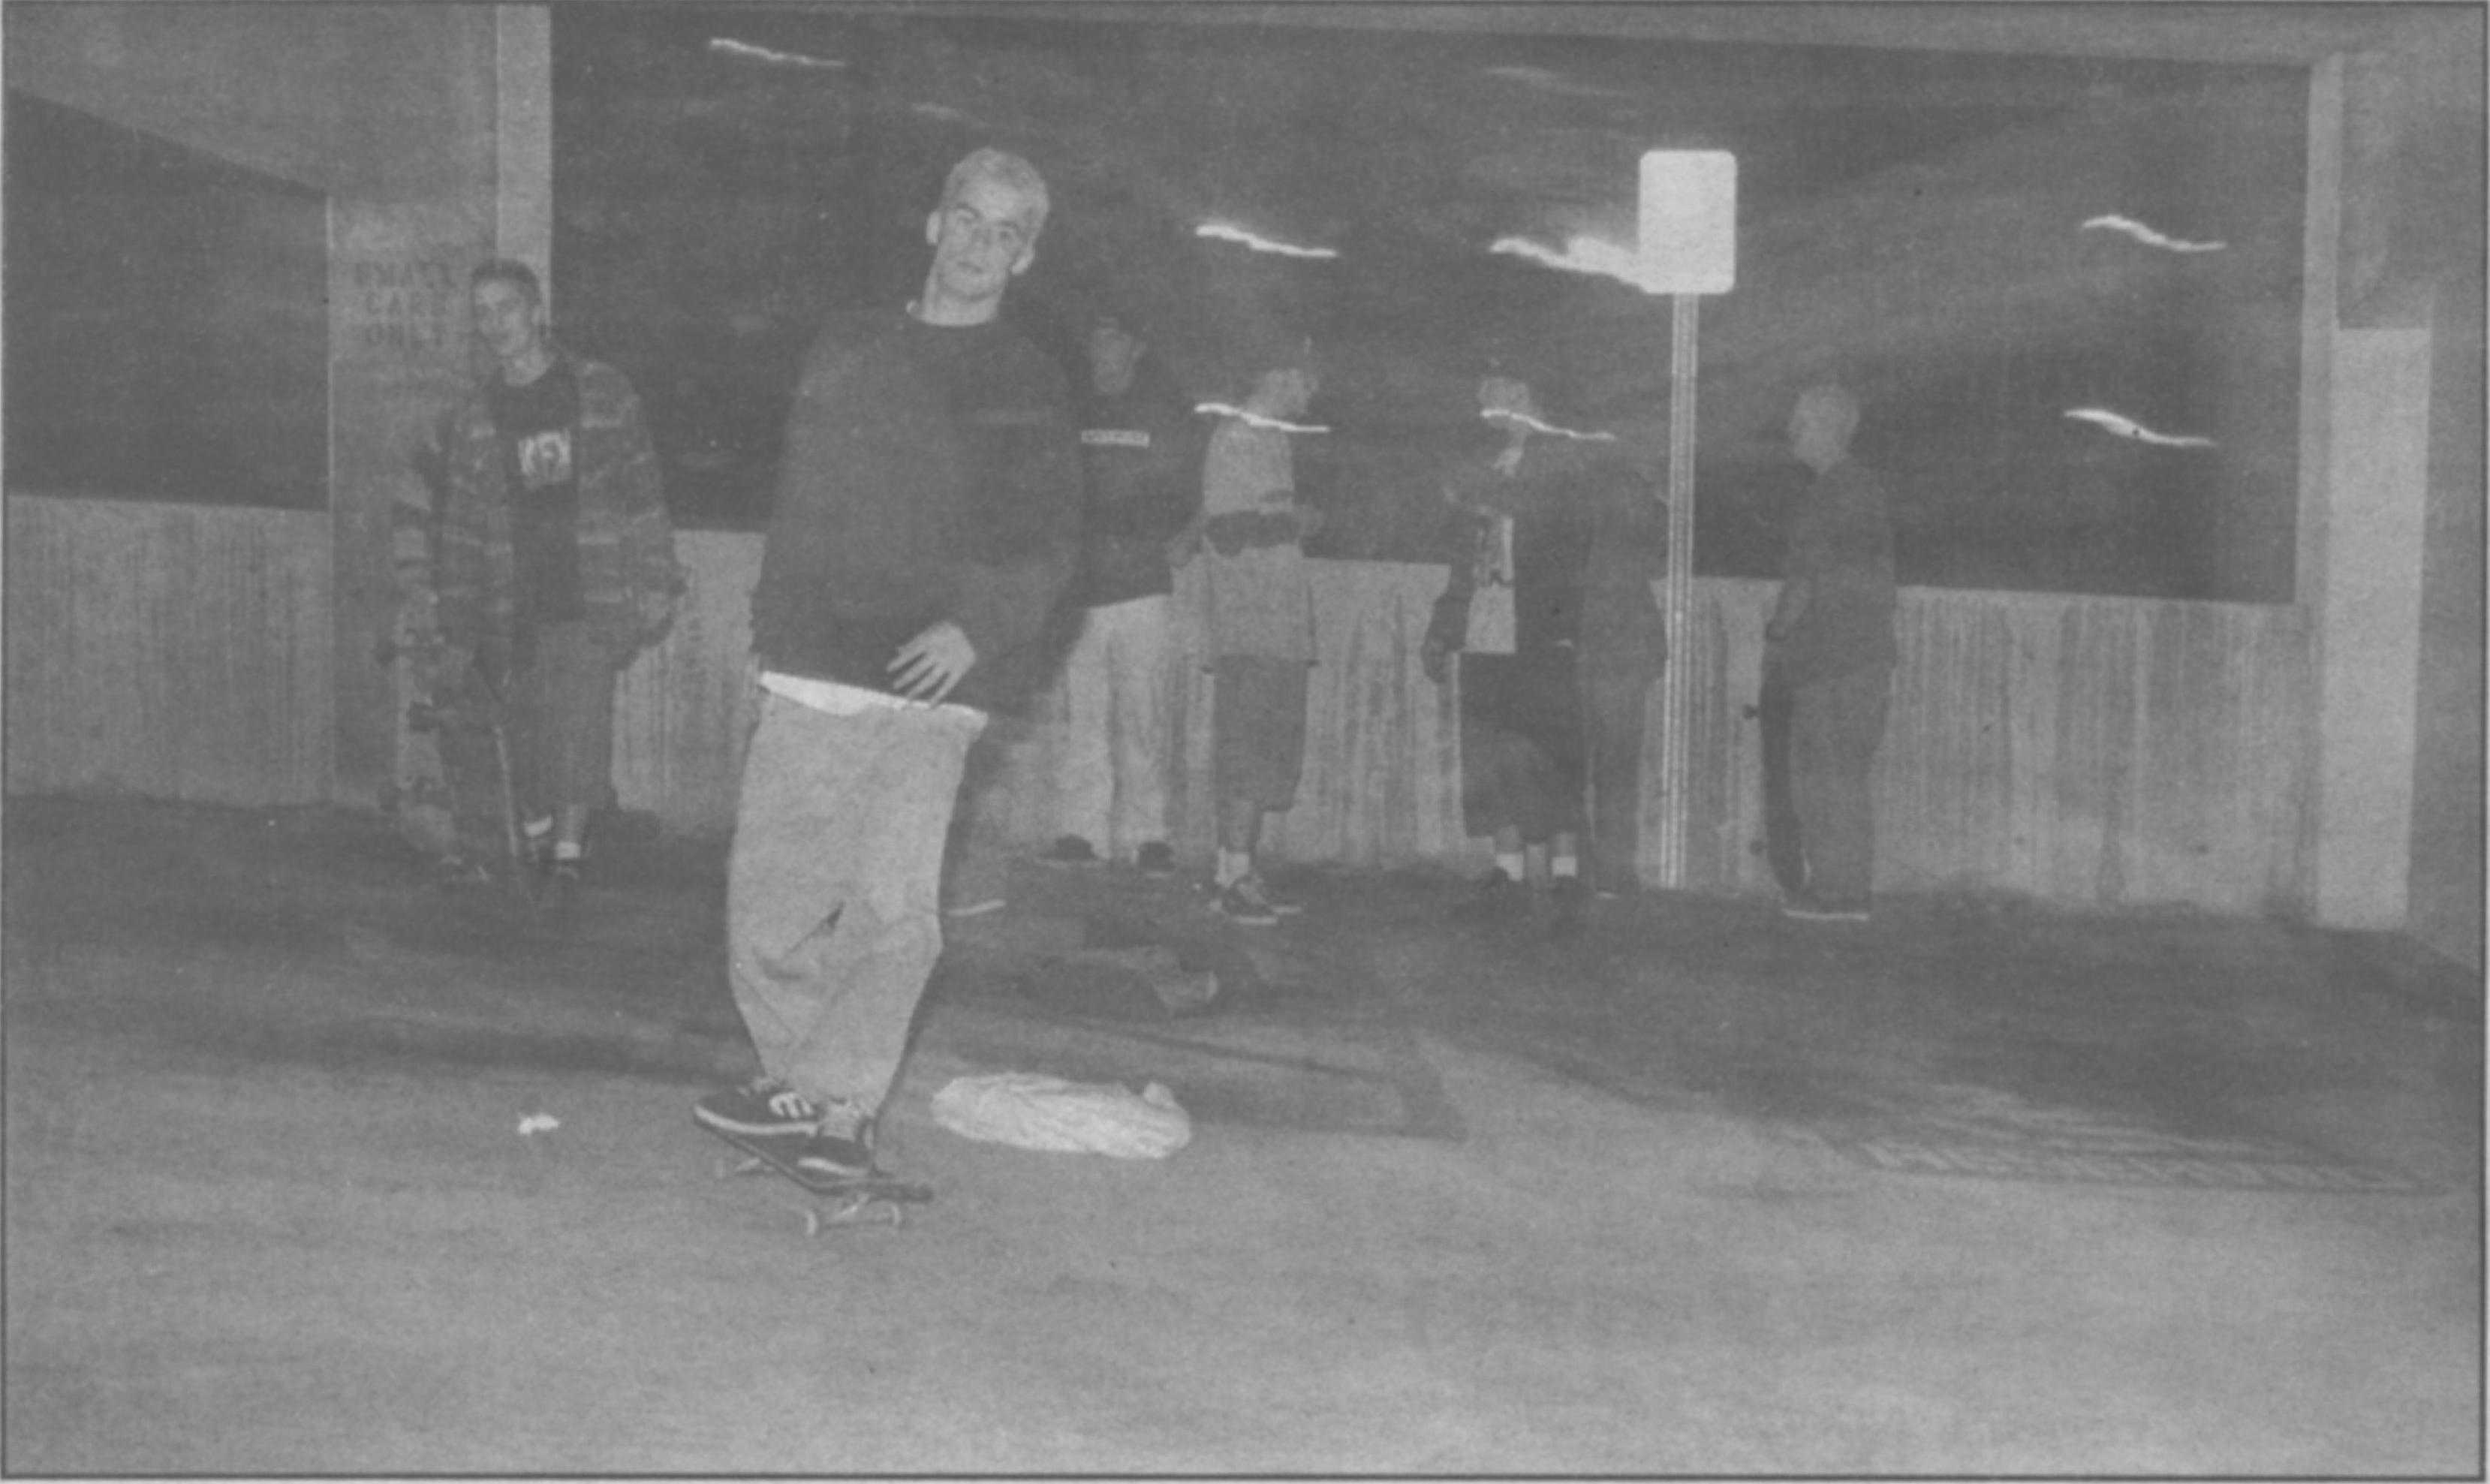 Skater Xl Crash